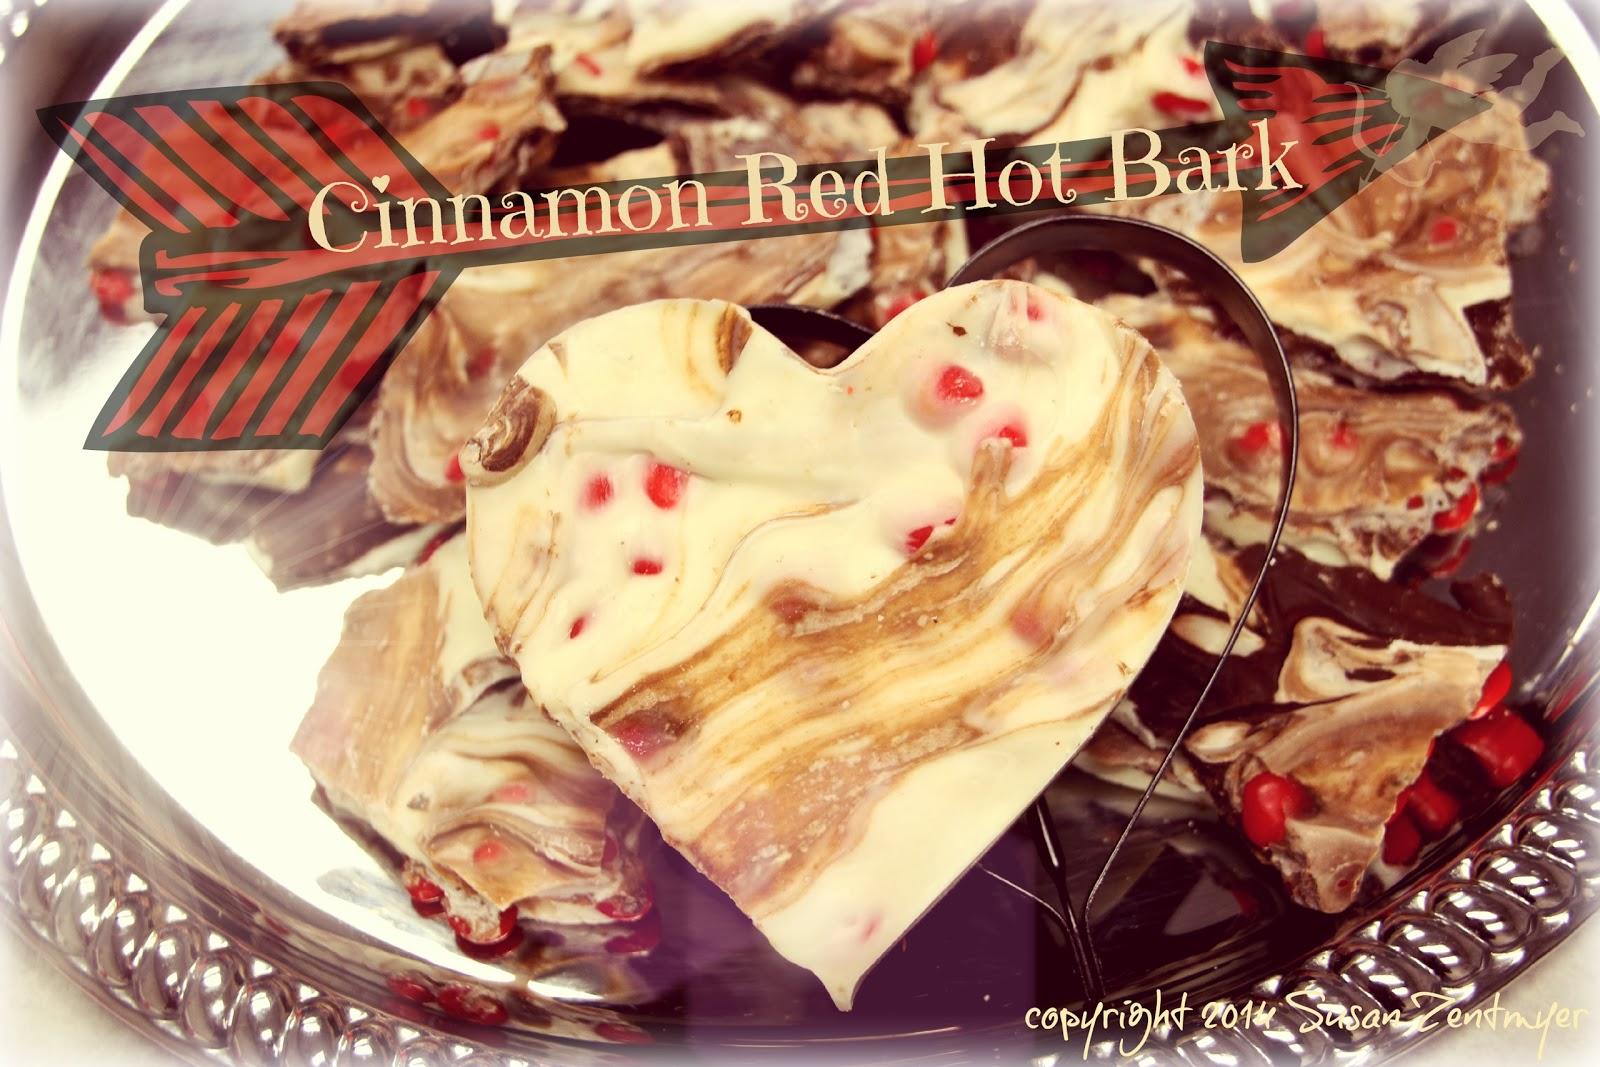 cinnamon red hot bark